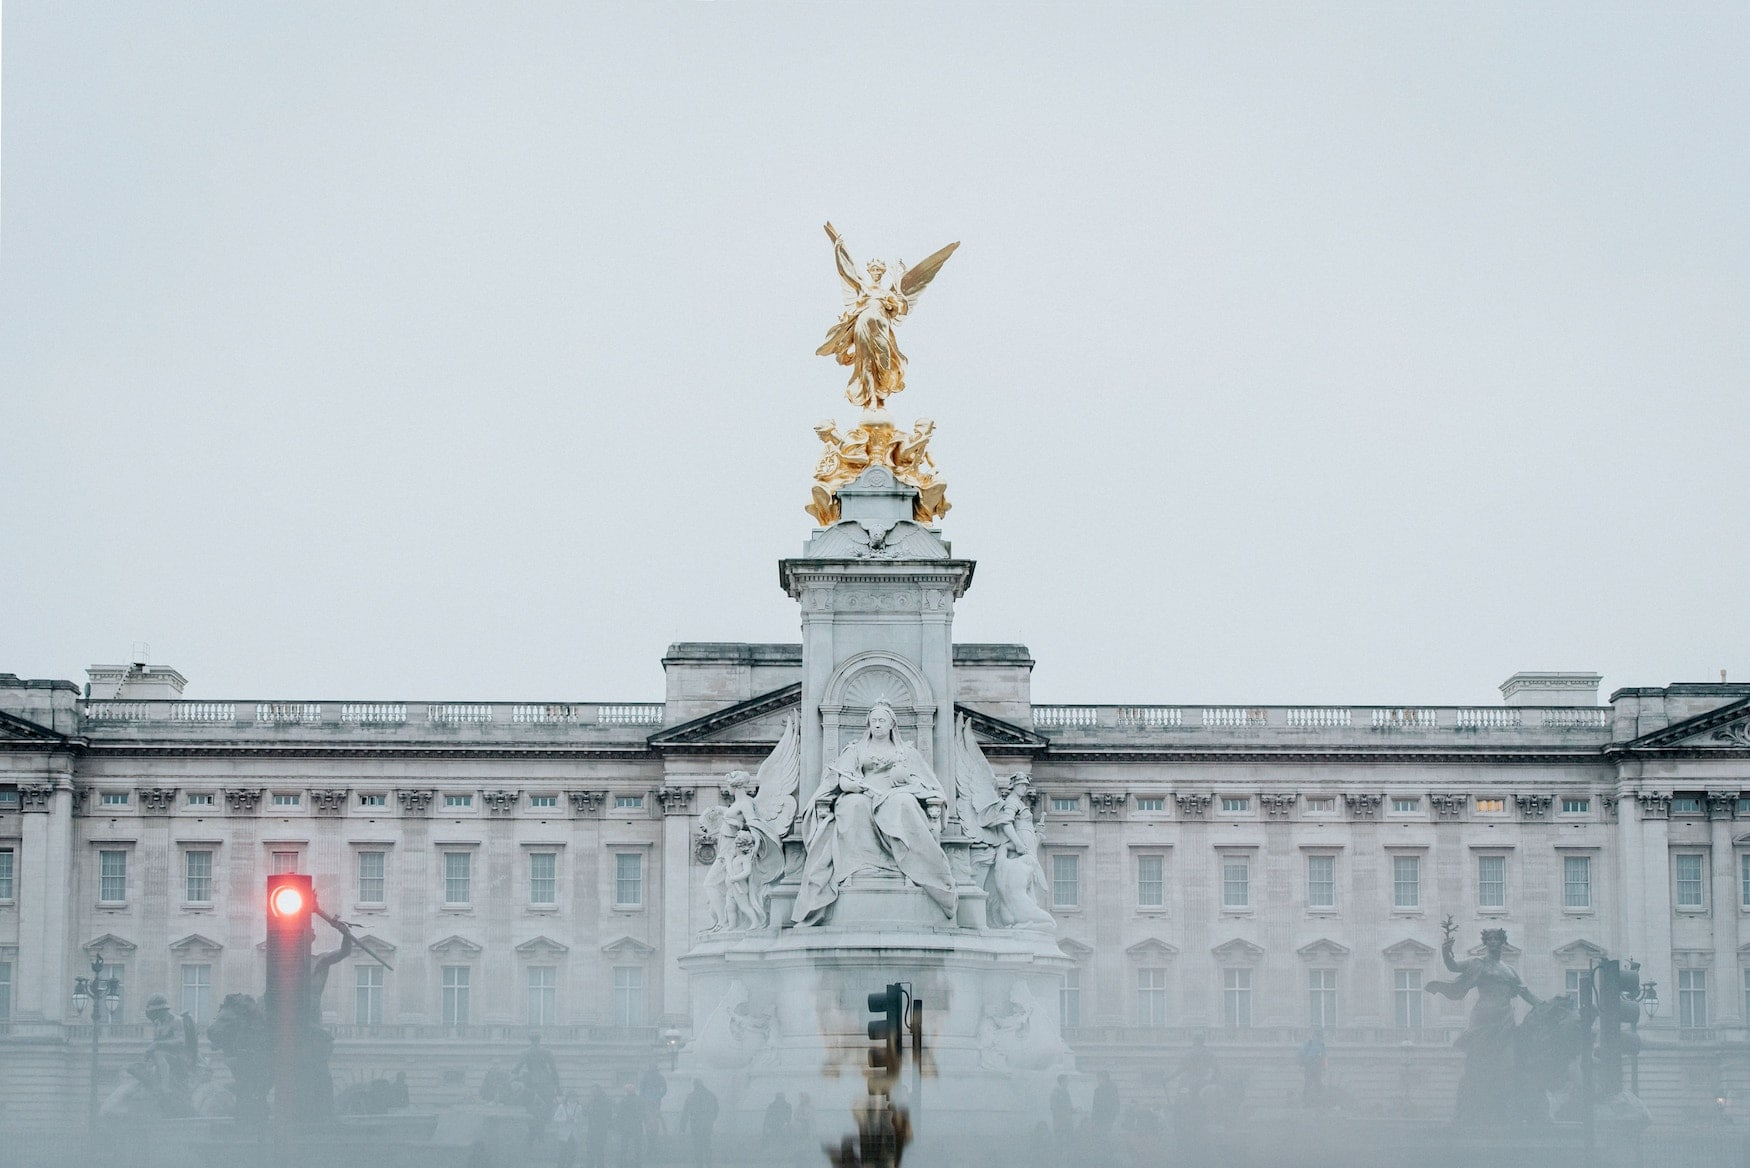 Vernebelter Buckingham Palace in London